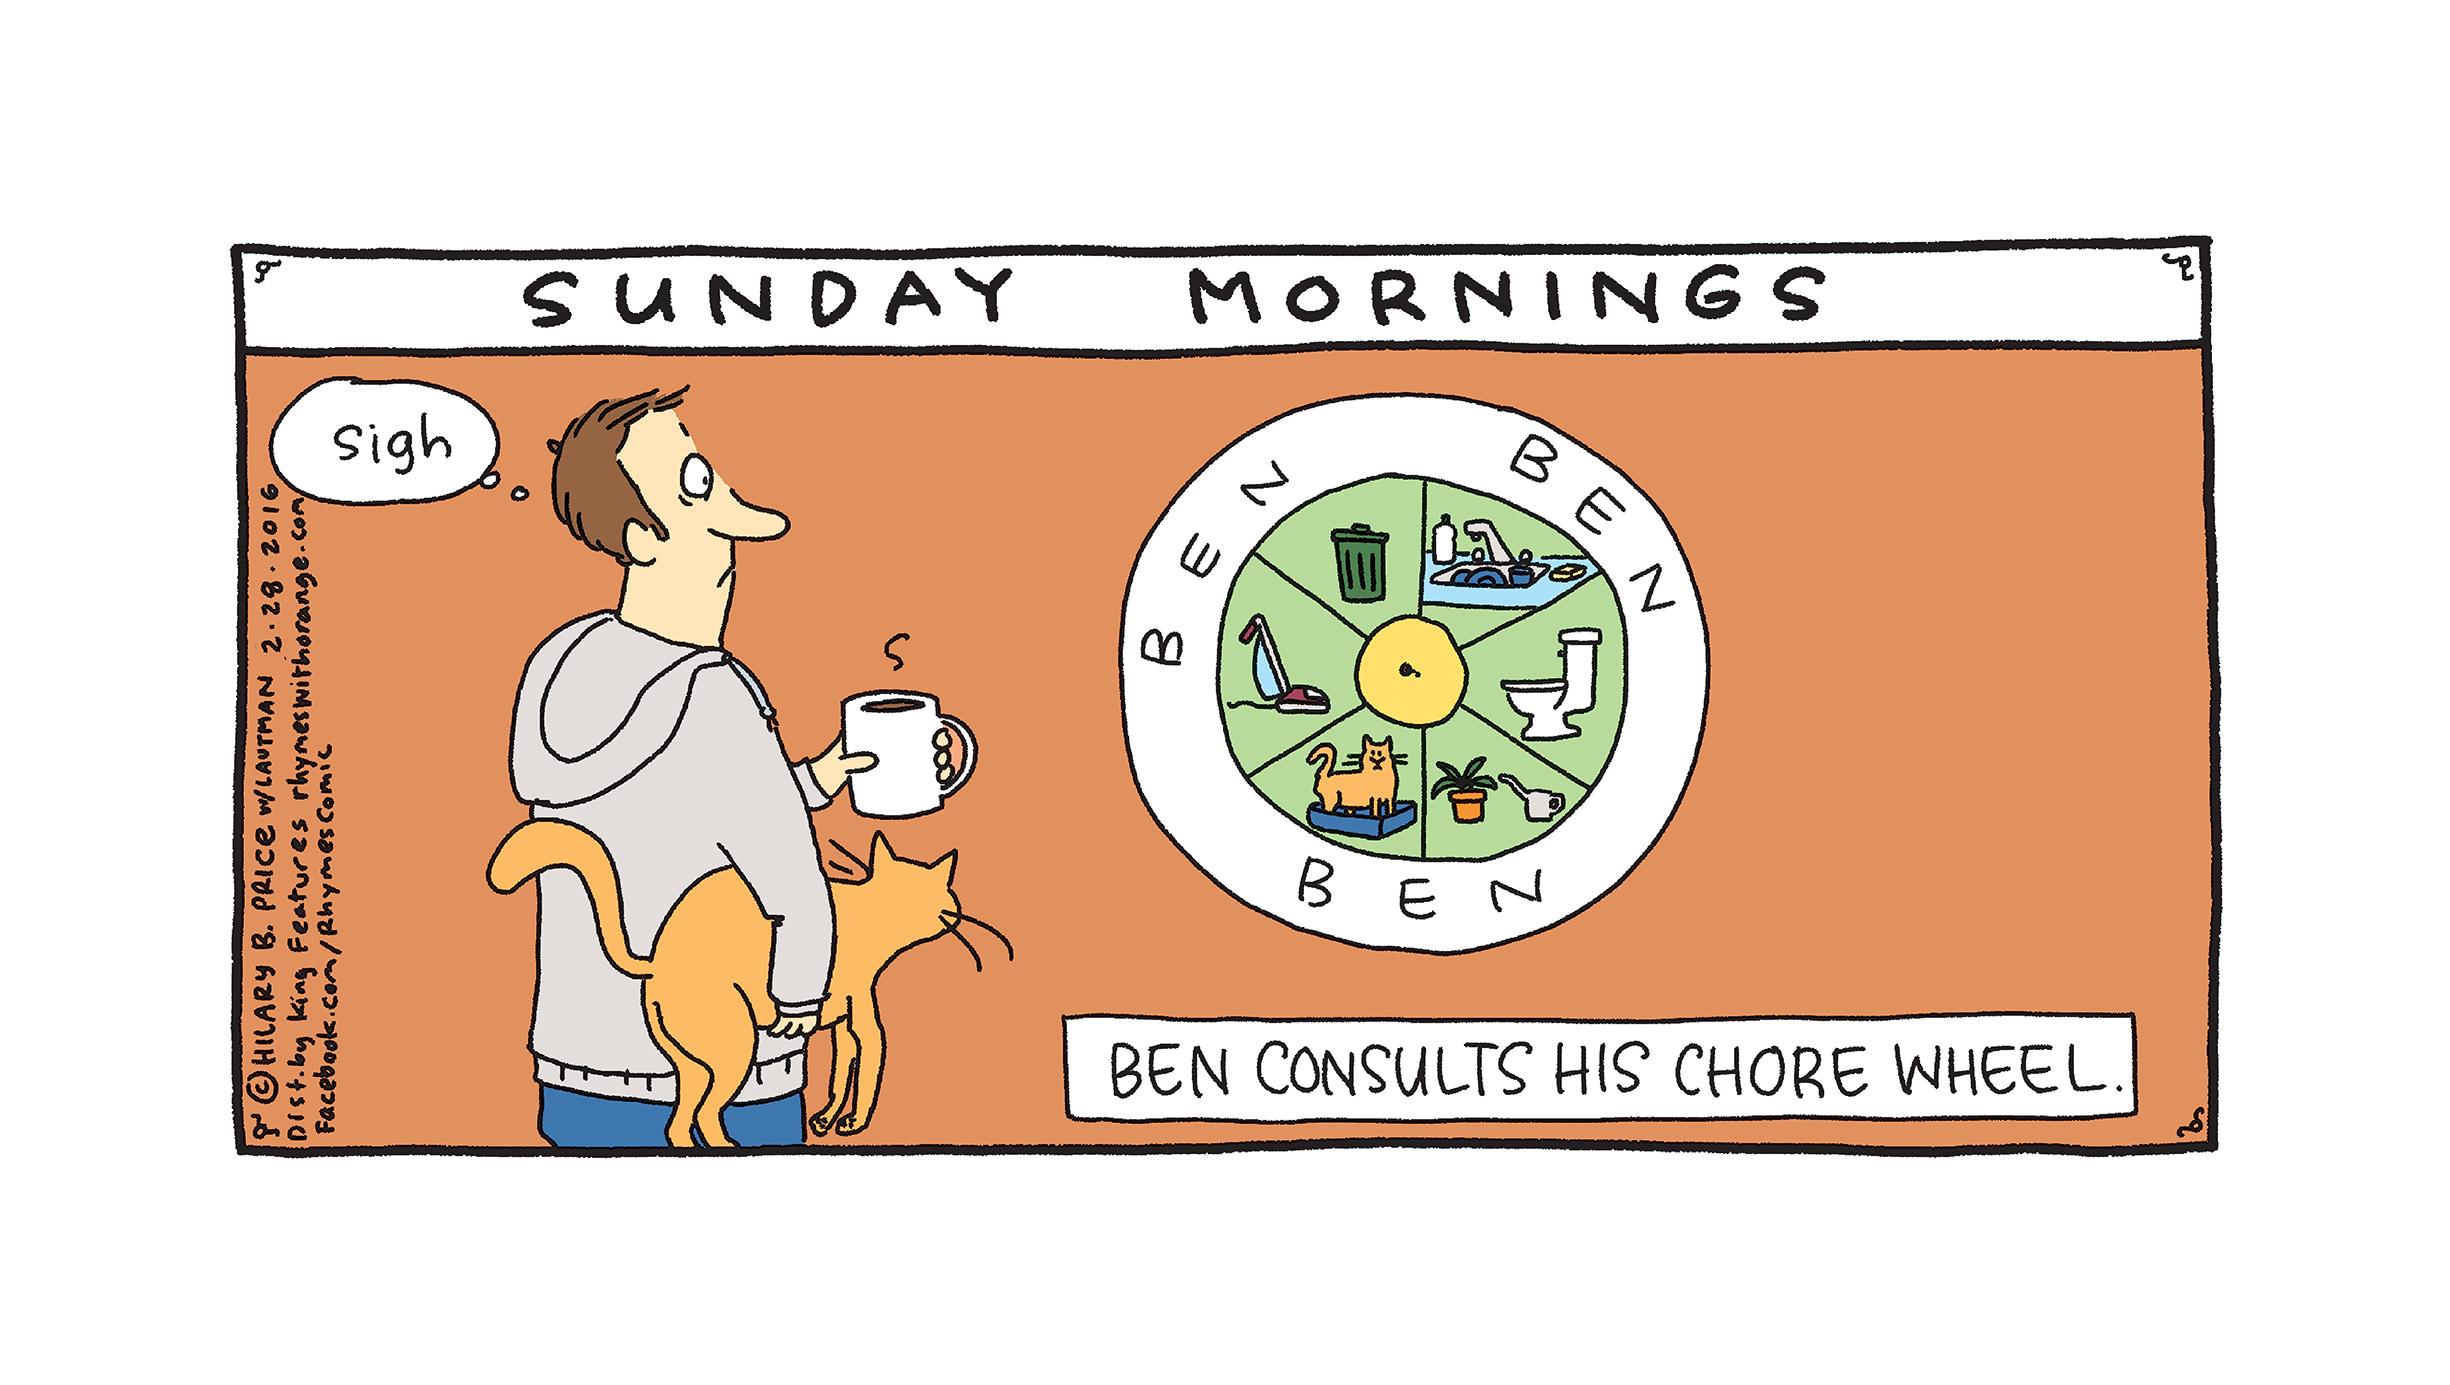 Chore wheel.jpg